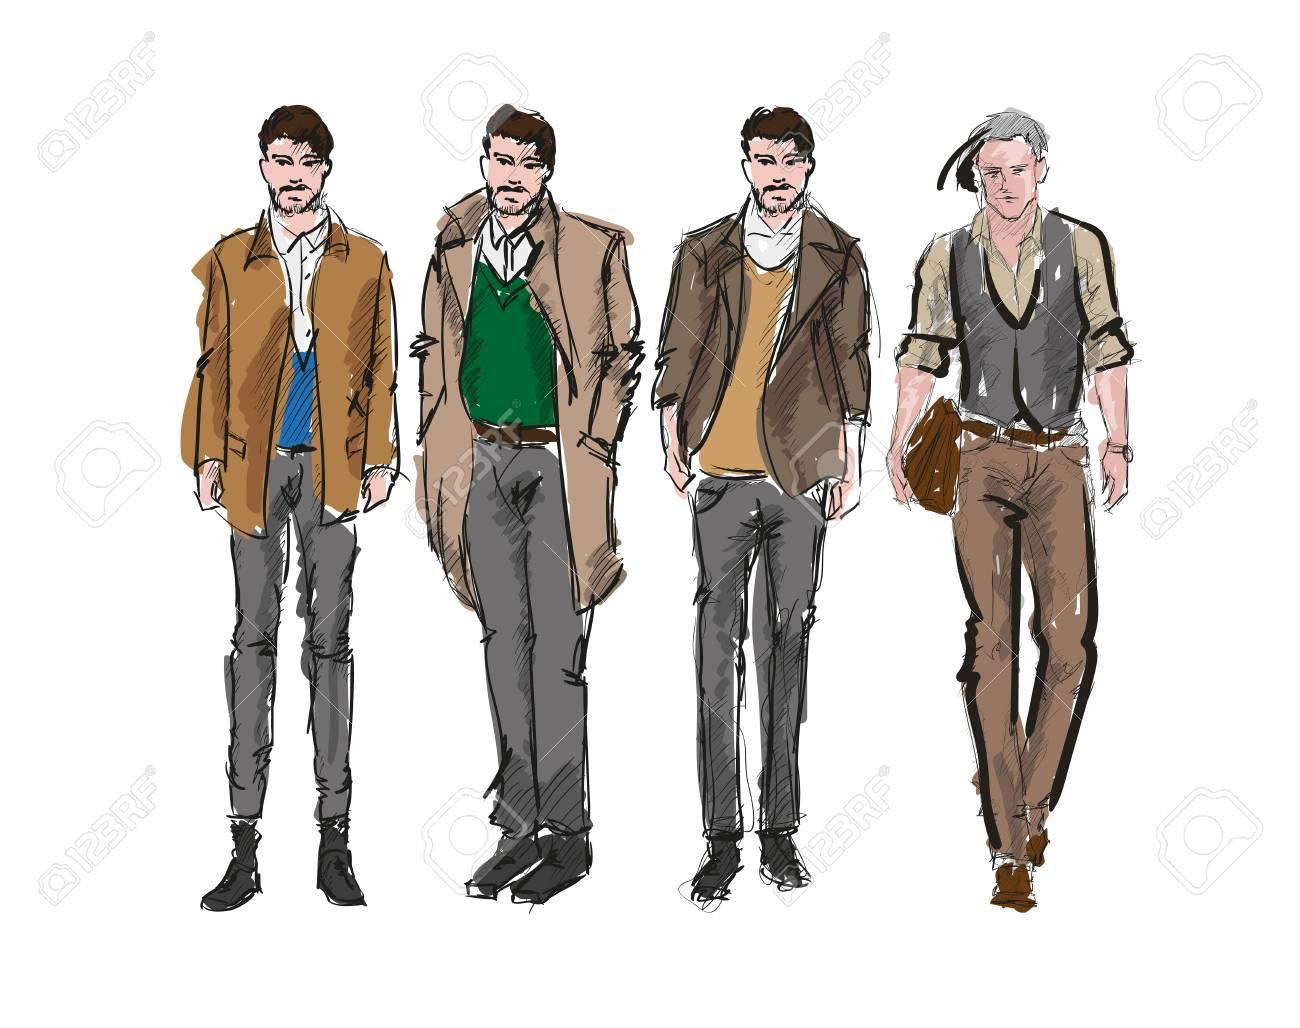 Fashion man. Set of fashiona mens sketches on a white background